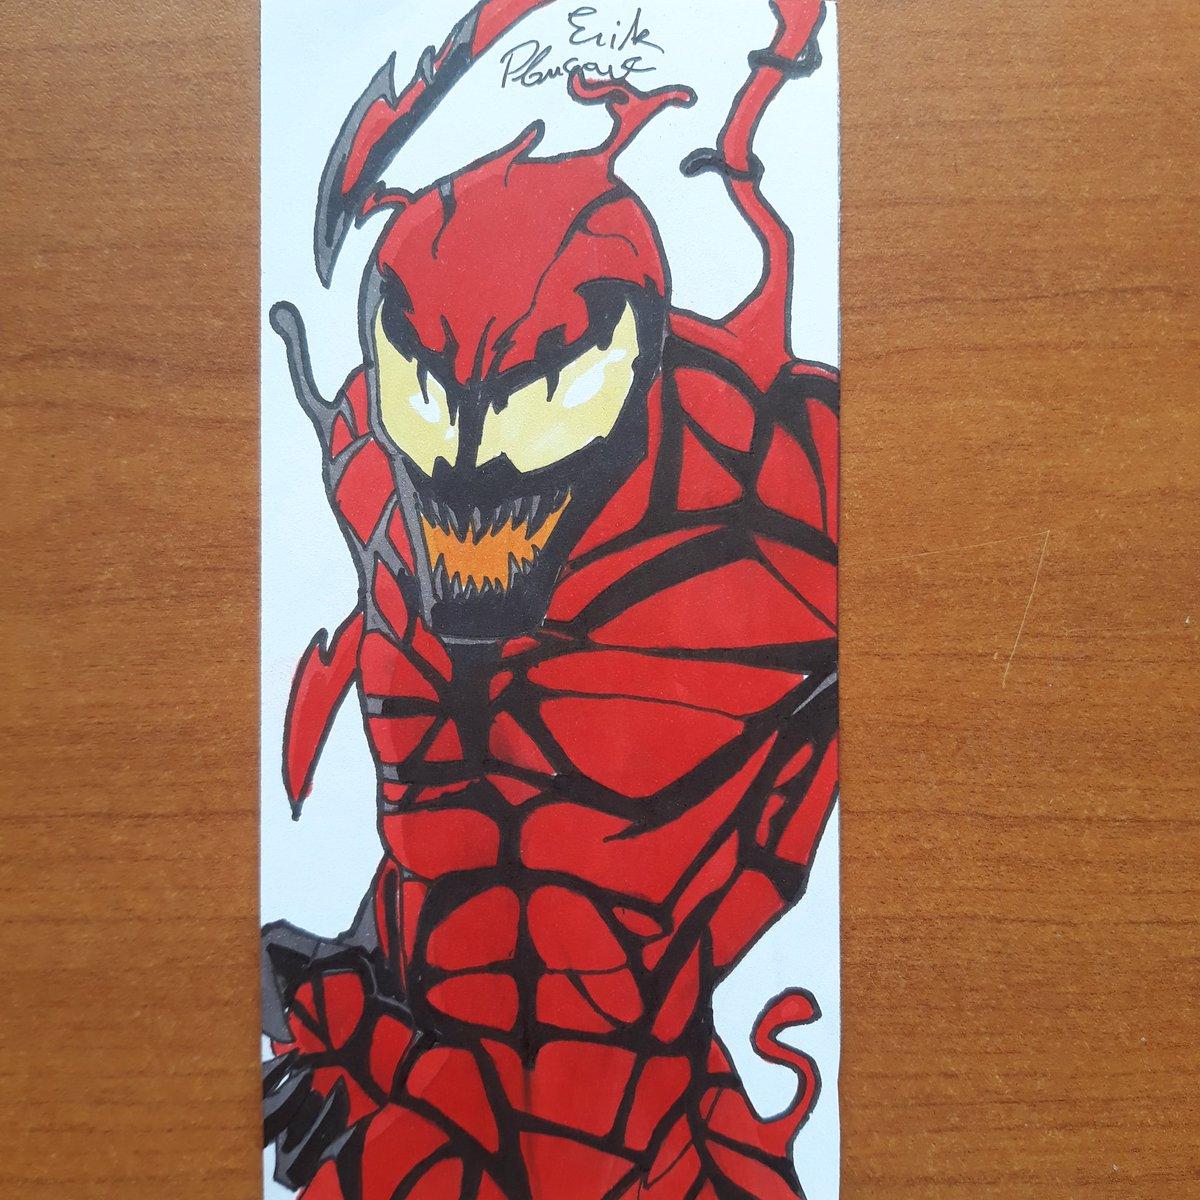 Carnage  #spiderman #symbiote #carnage #marvel #superhero #Fanart #Animestyle #anime #traditionaldrawing #draw #drawing #dessin #mangastyle #mangadraw #manga #mangaart #art #artdrawing #instart #originalart #artwork #artist #instaart #animeart #marvelvenompic.twitter.com/bwme62k4eM